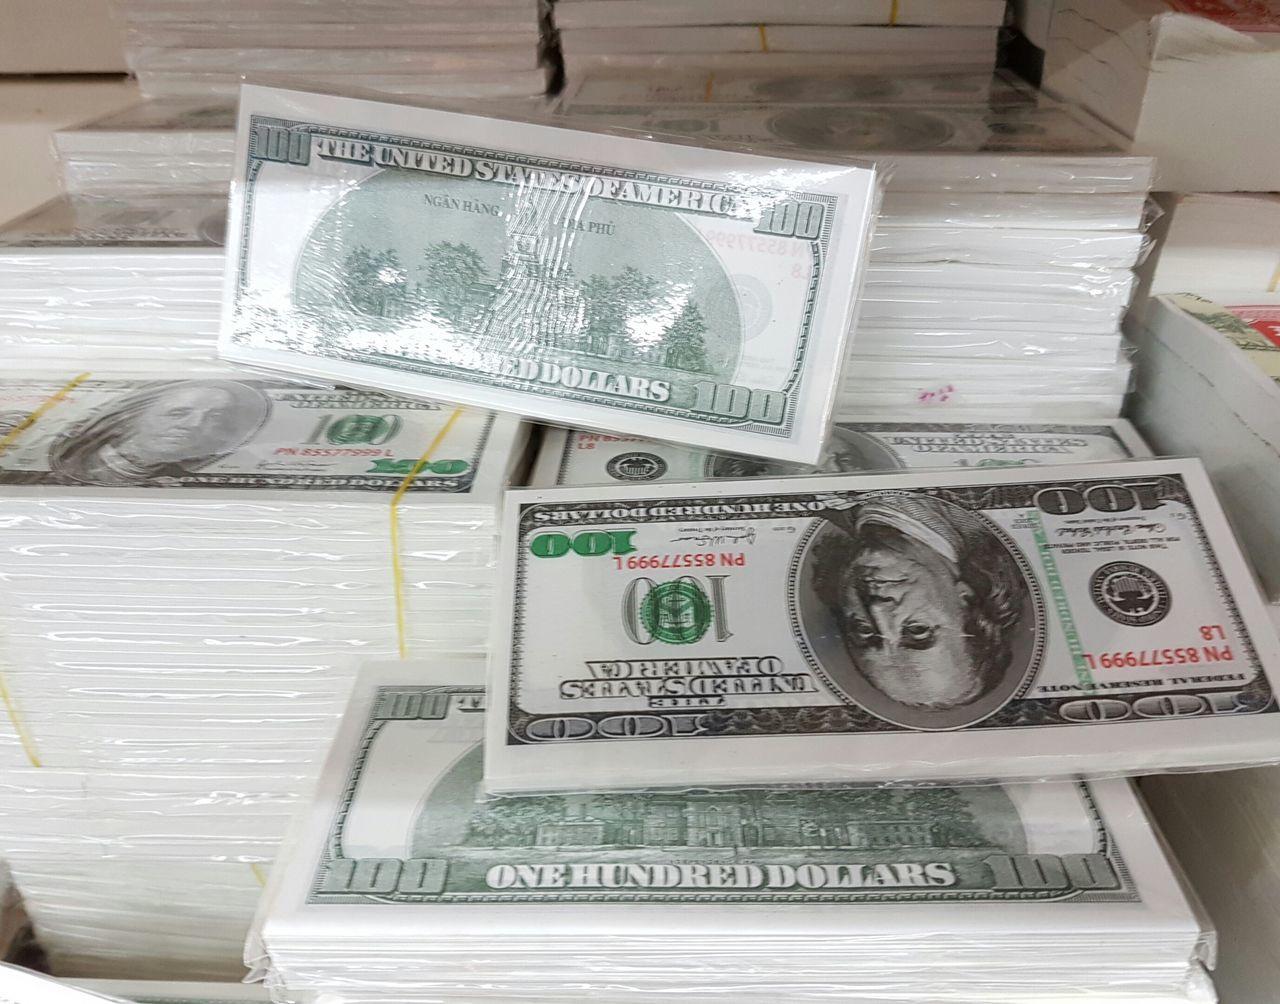 Corrupt Mafia  Coruption Mafia  Banking Mafia  Business Moneyshot Economy Finanzen Finance And Economy Business Finance And Industry Fake Money Money Backgrounds Background For Sale Industry Dollar Dollars Dollar Notes Fake Dollar 100 Dollar Trump Finance